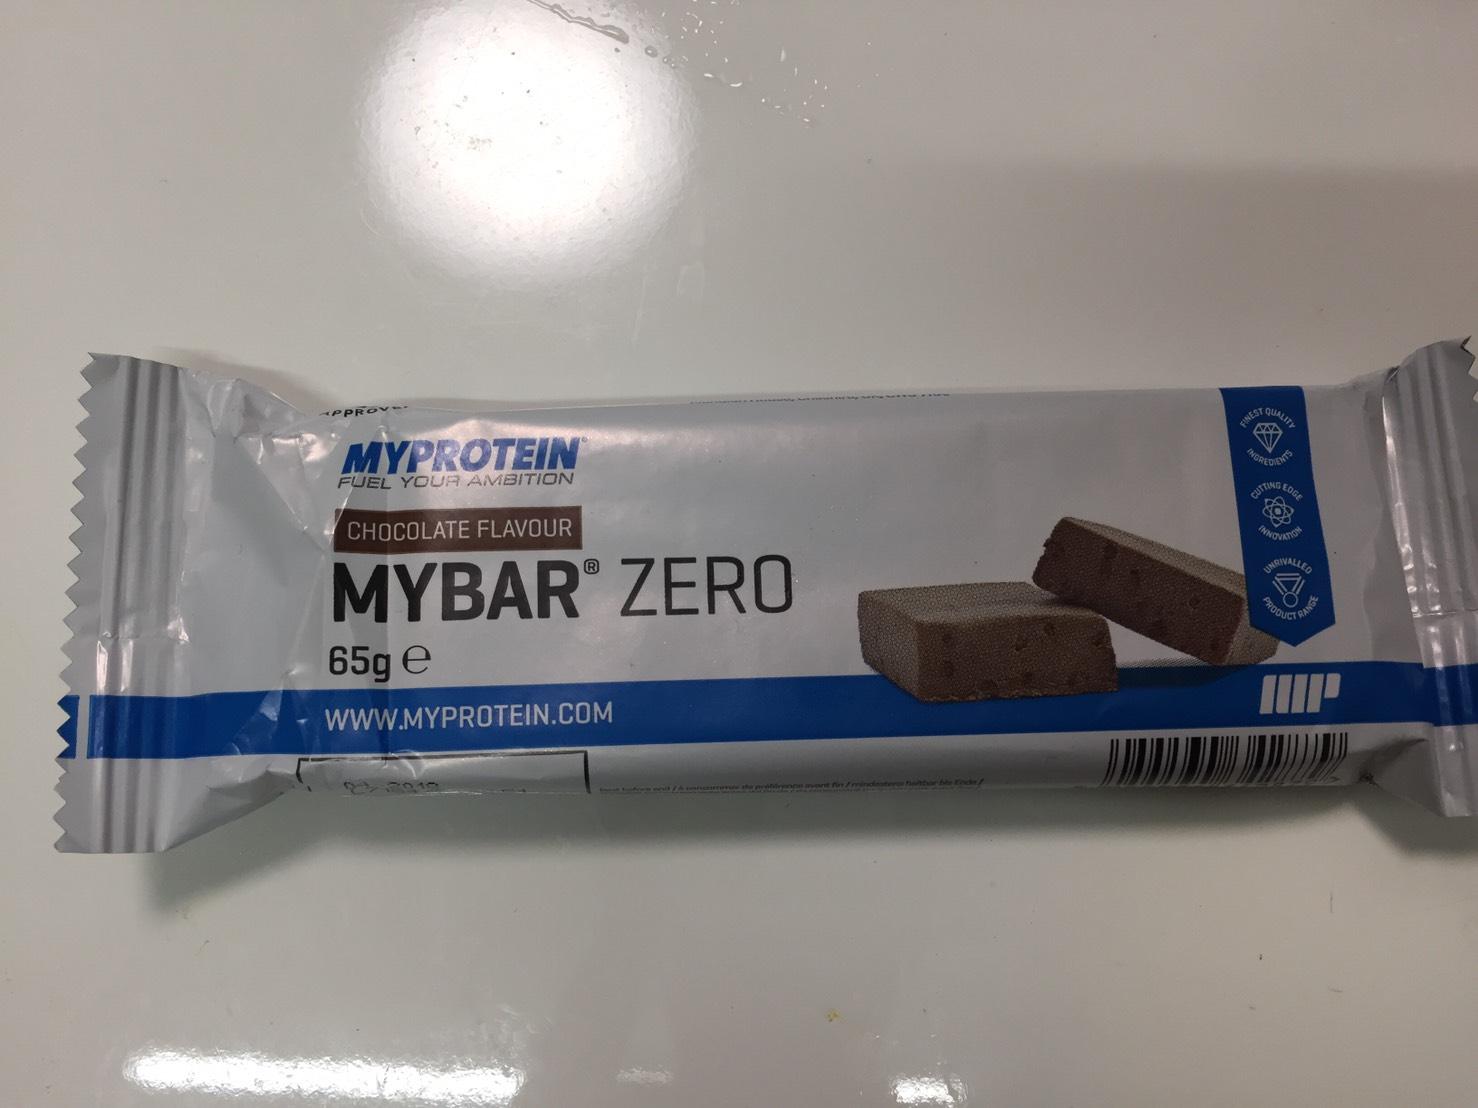 MY BAR ZERO(マイバー・ゼロ)「CHOCOLATE FLAVOUR(チョコレート味)」の成分表